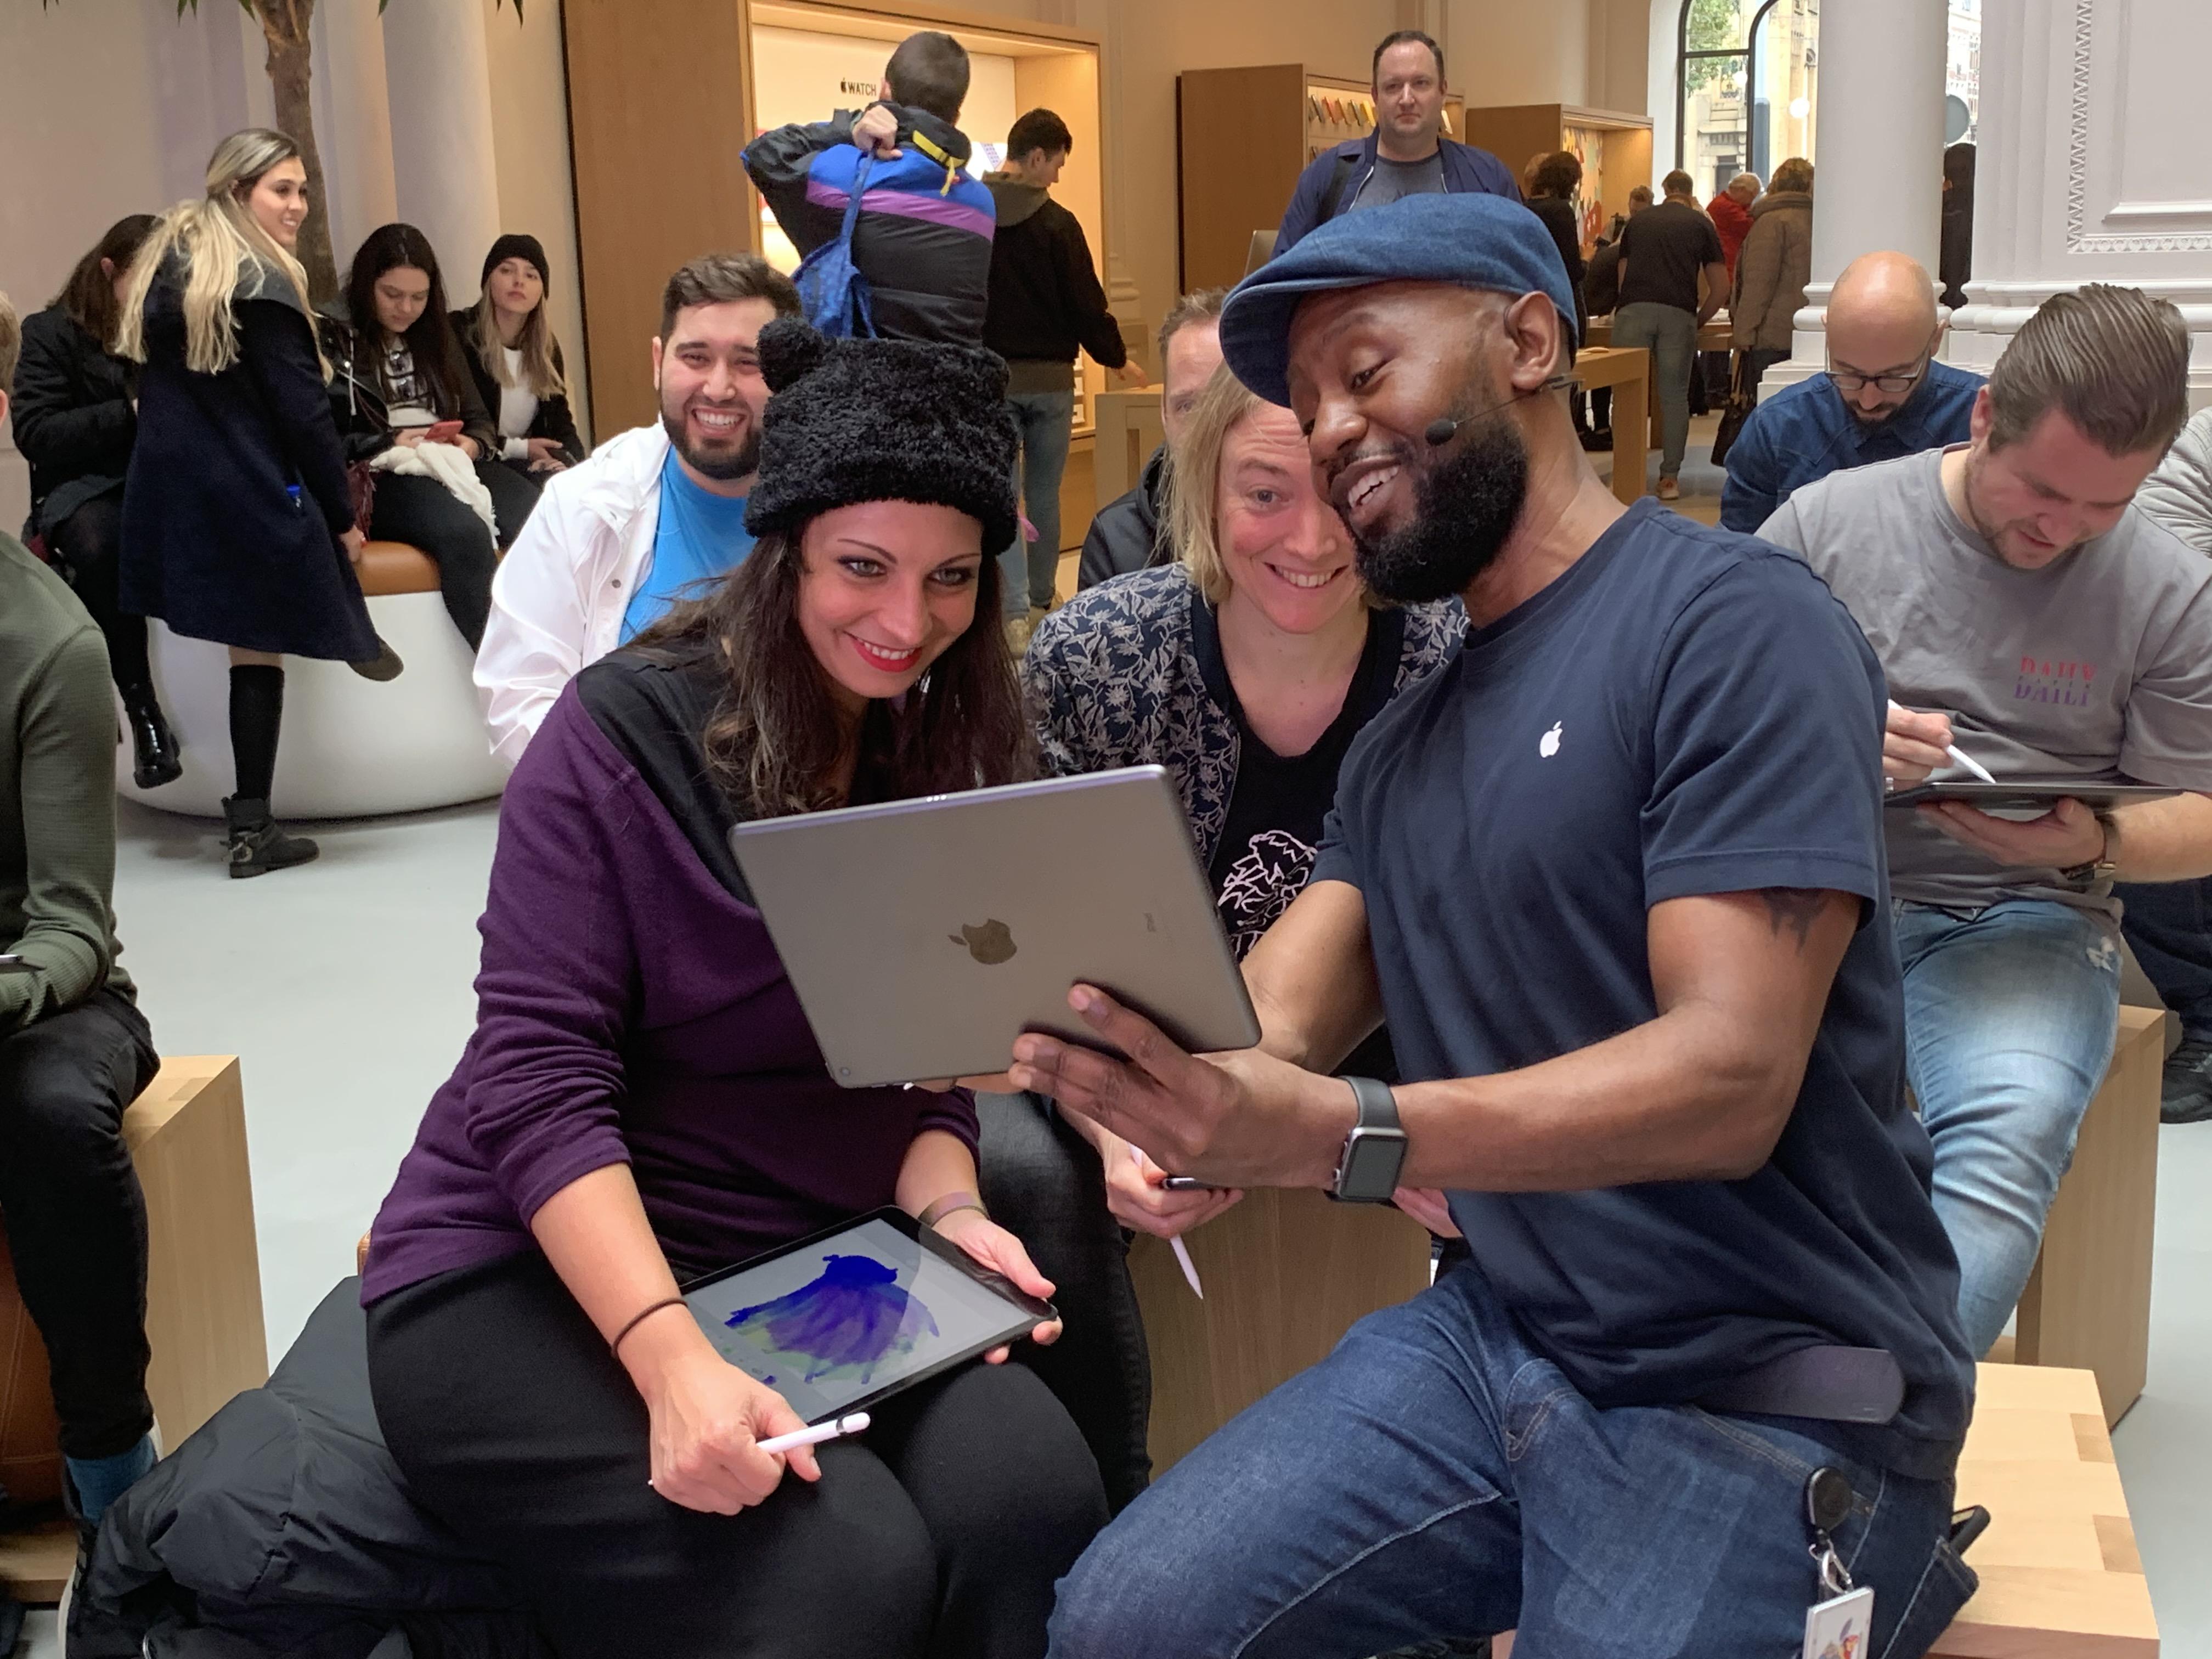 Apple Amsterdam heropening 2019 - 004